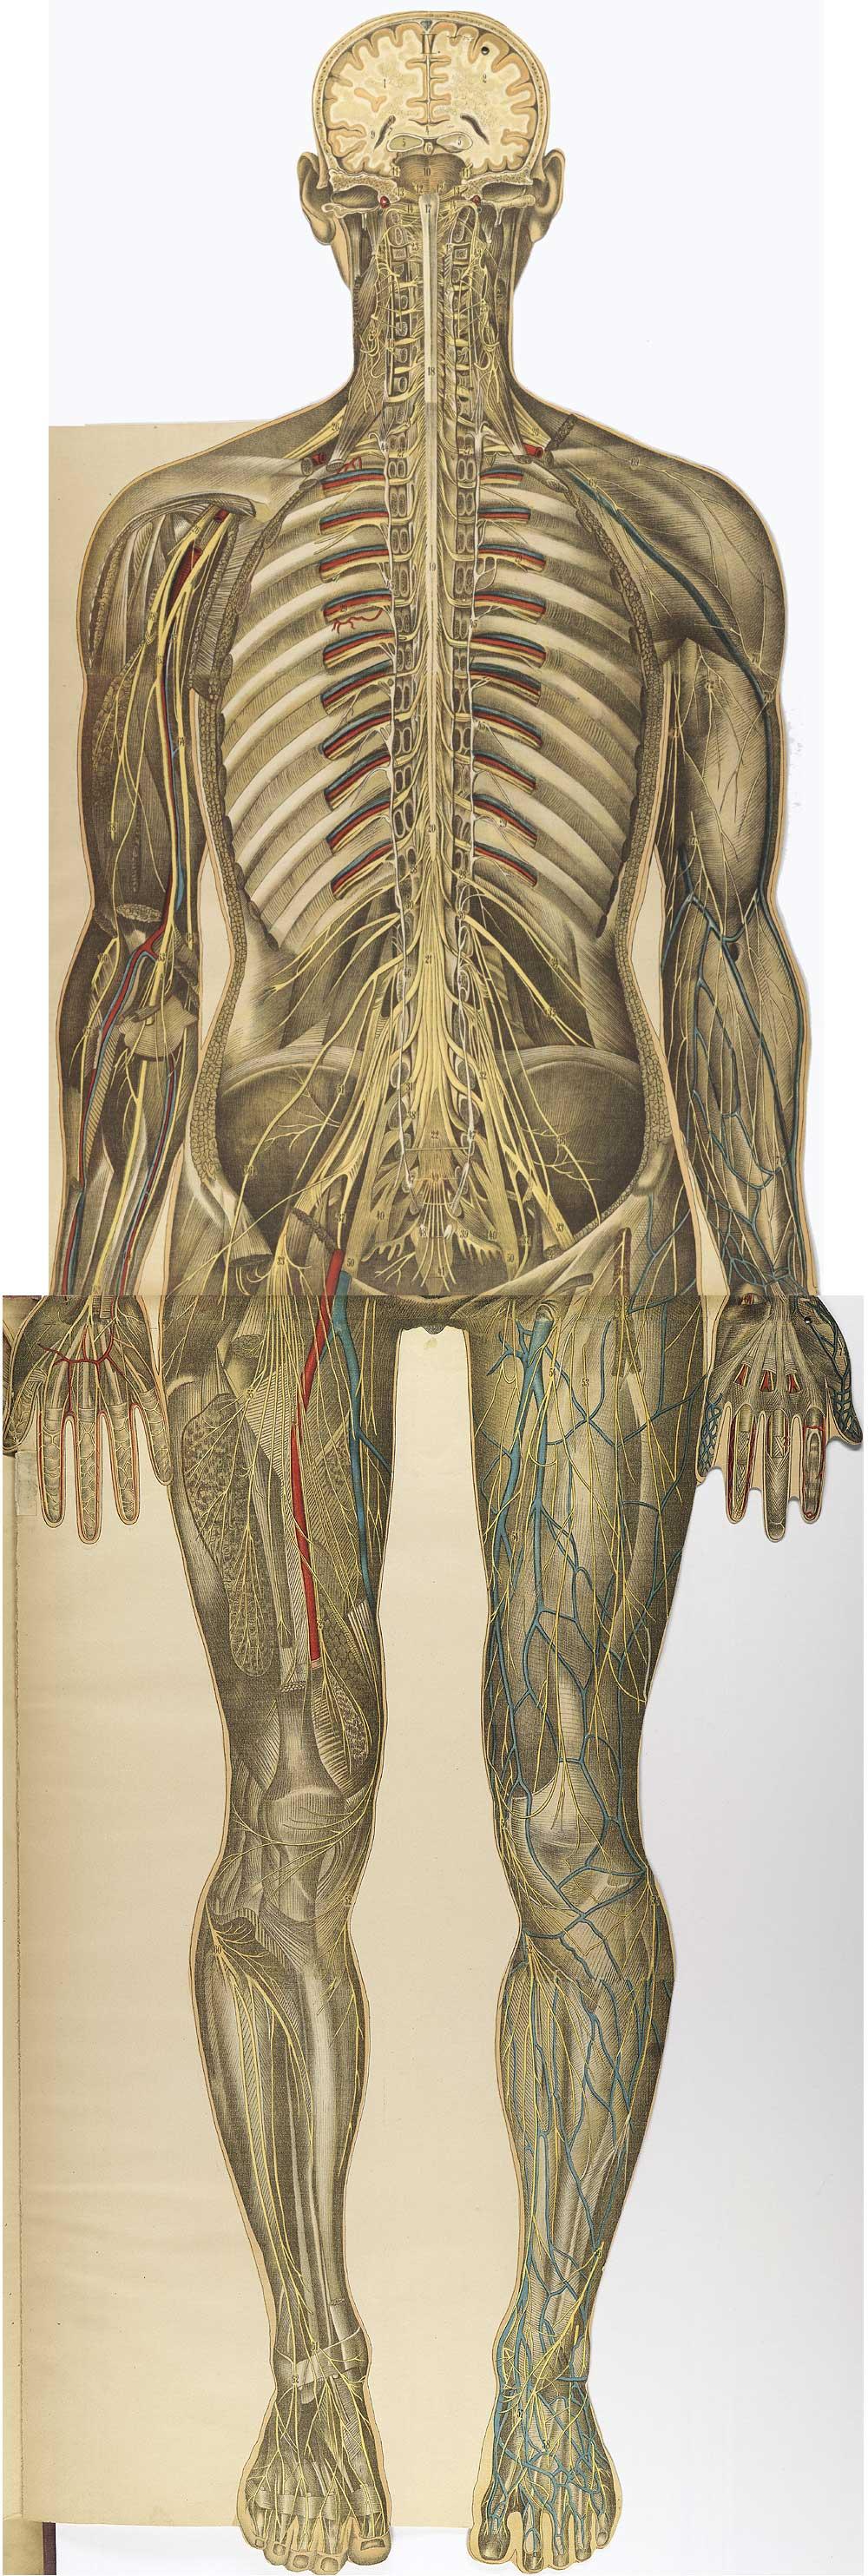 bougle | Homo sapiens | Pinterest | Ilustracion cientifica, Anatomía ...